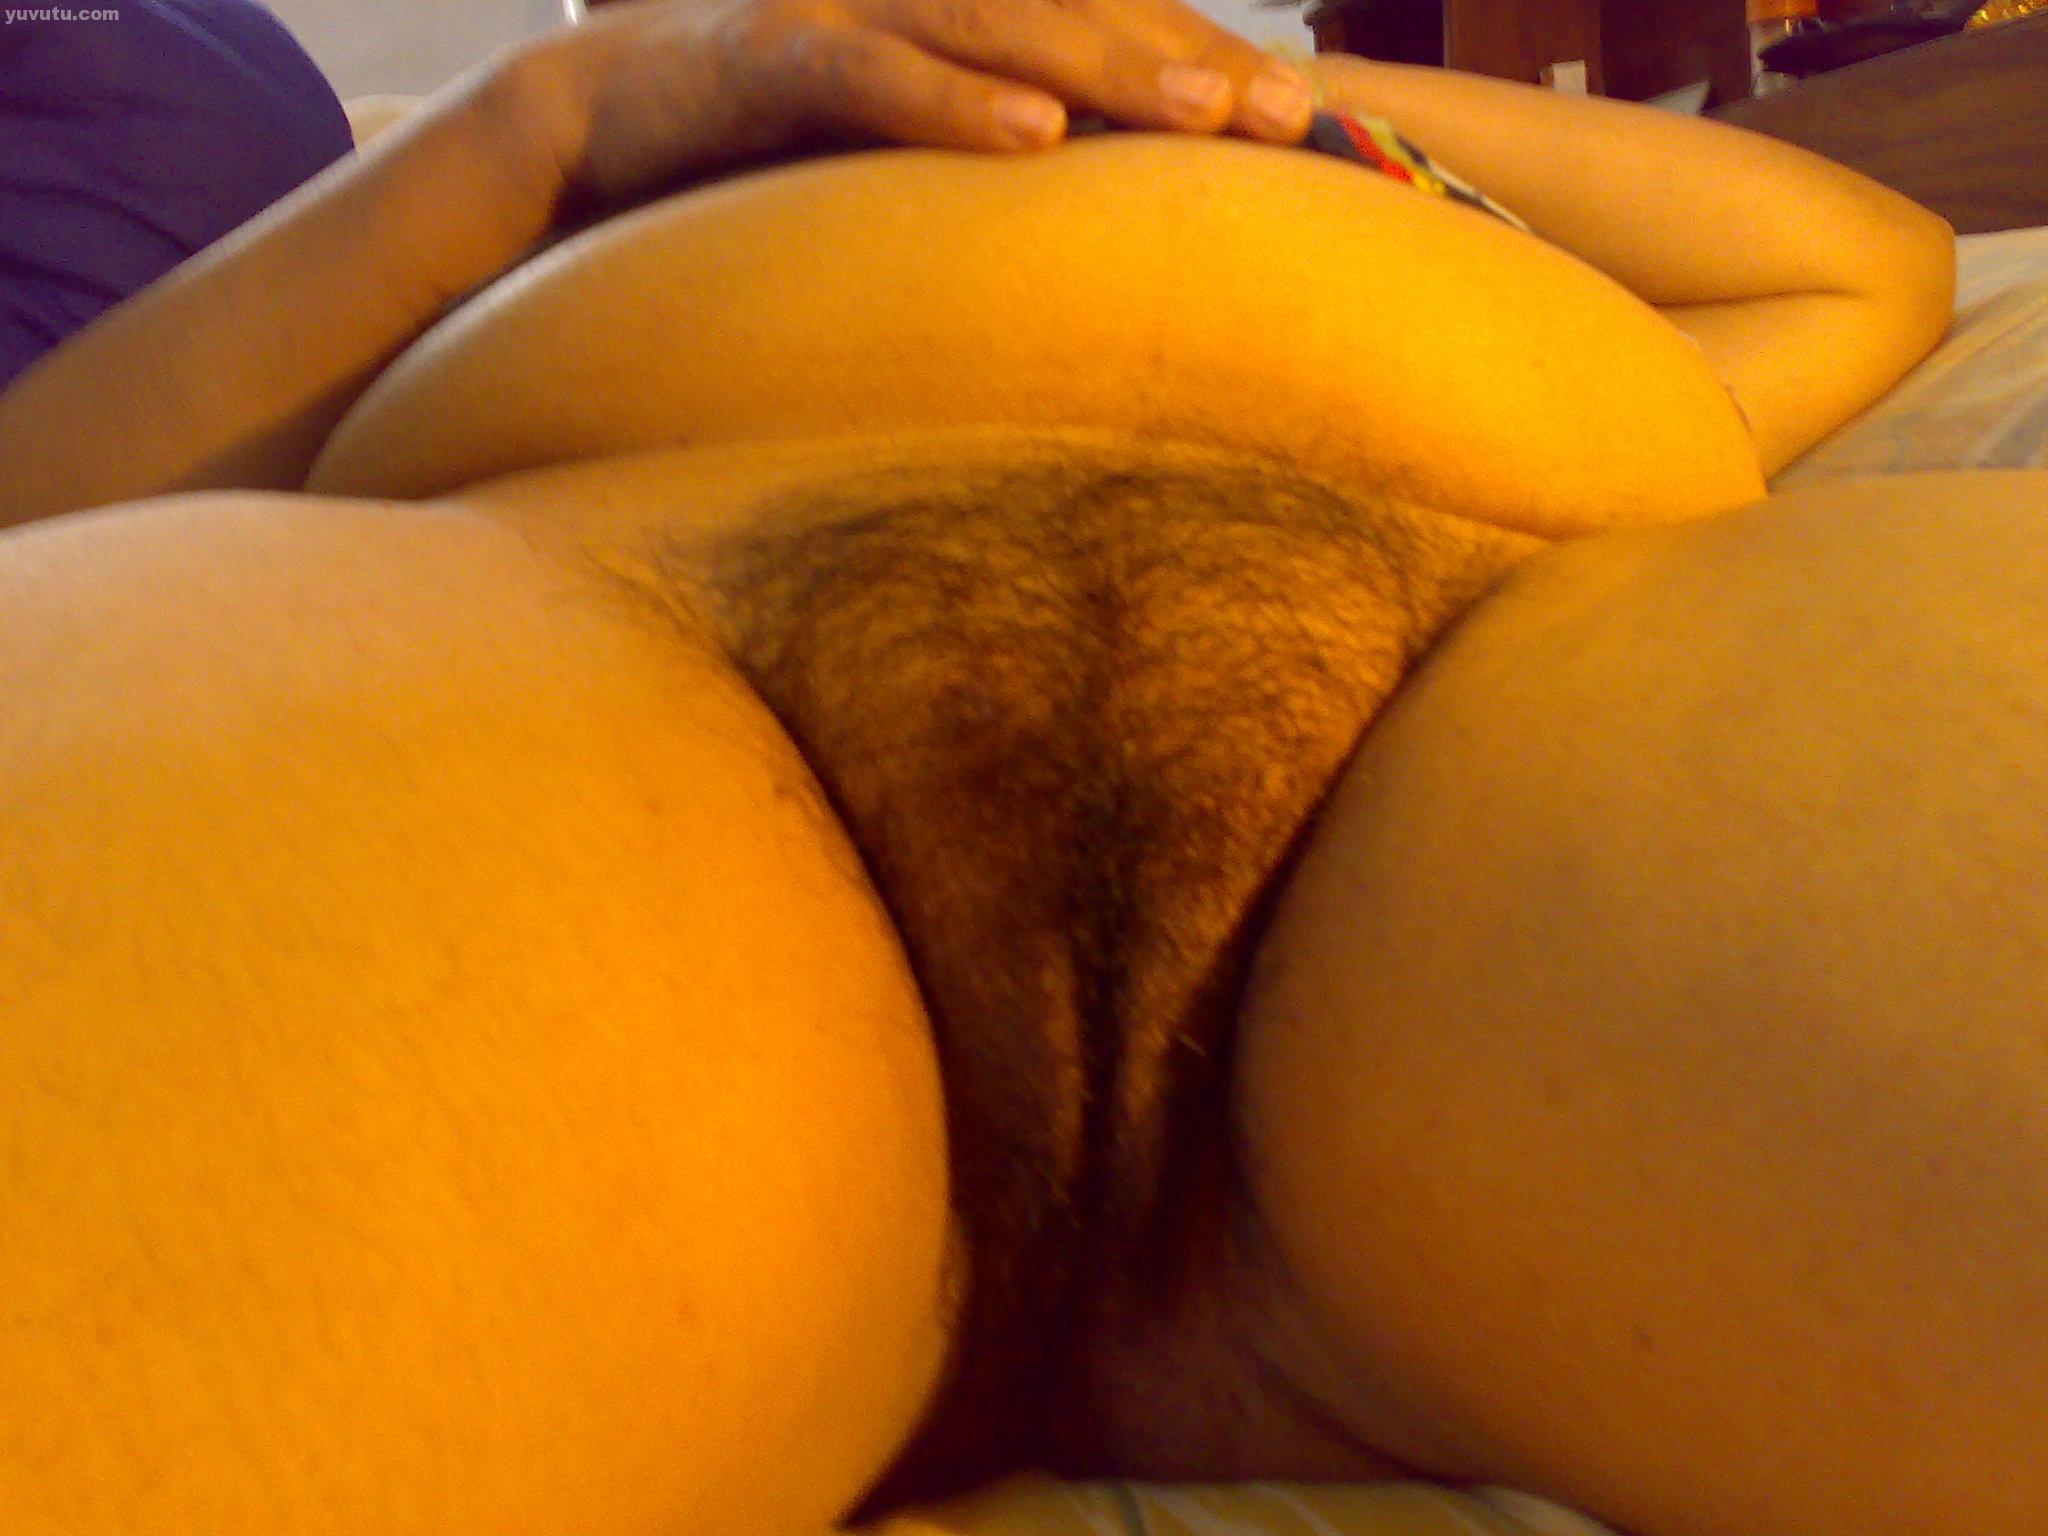 Solo anal tube